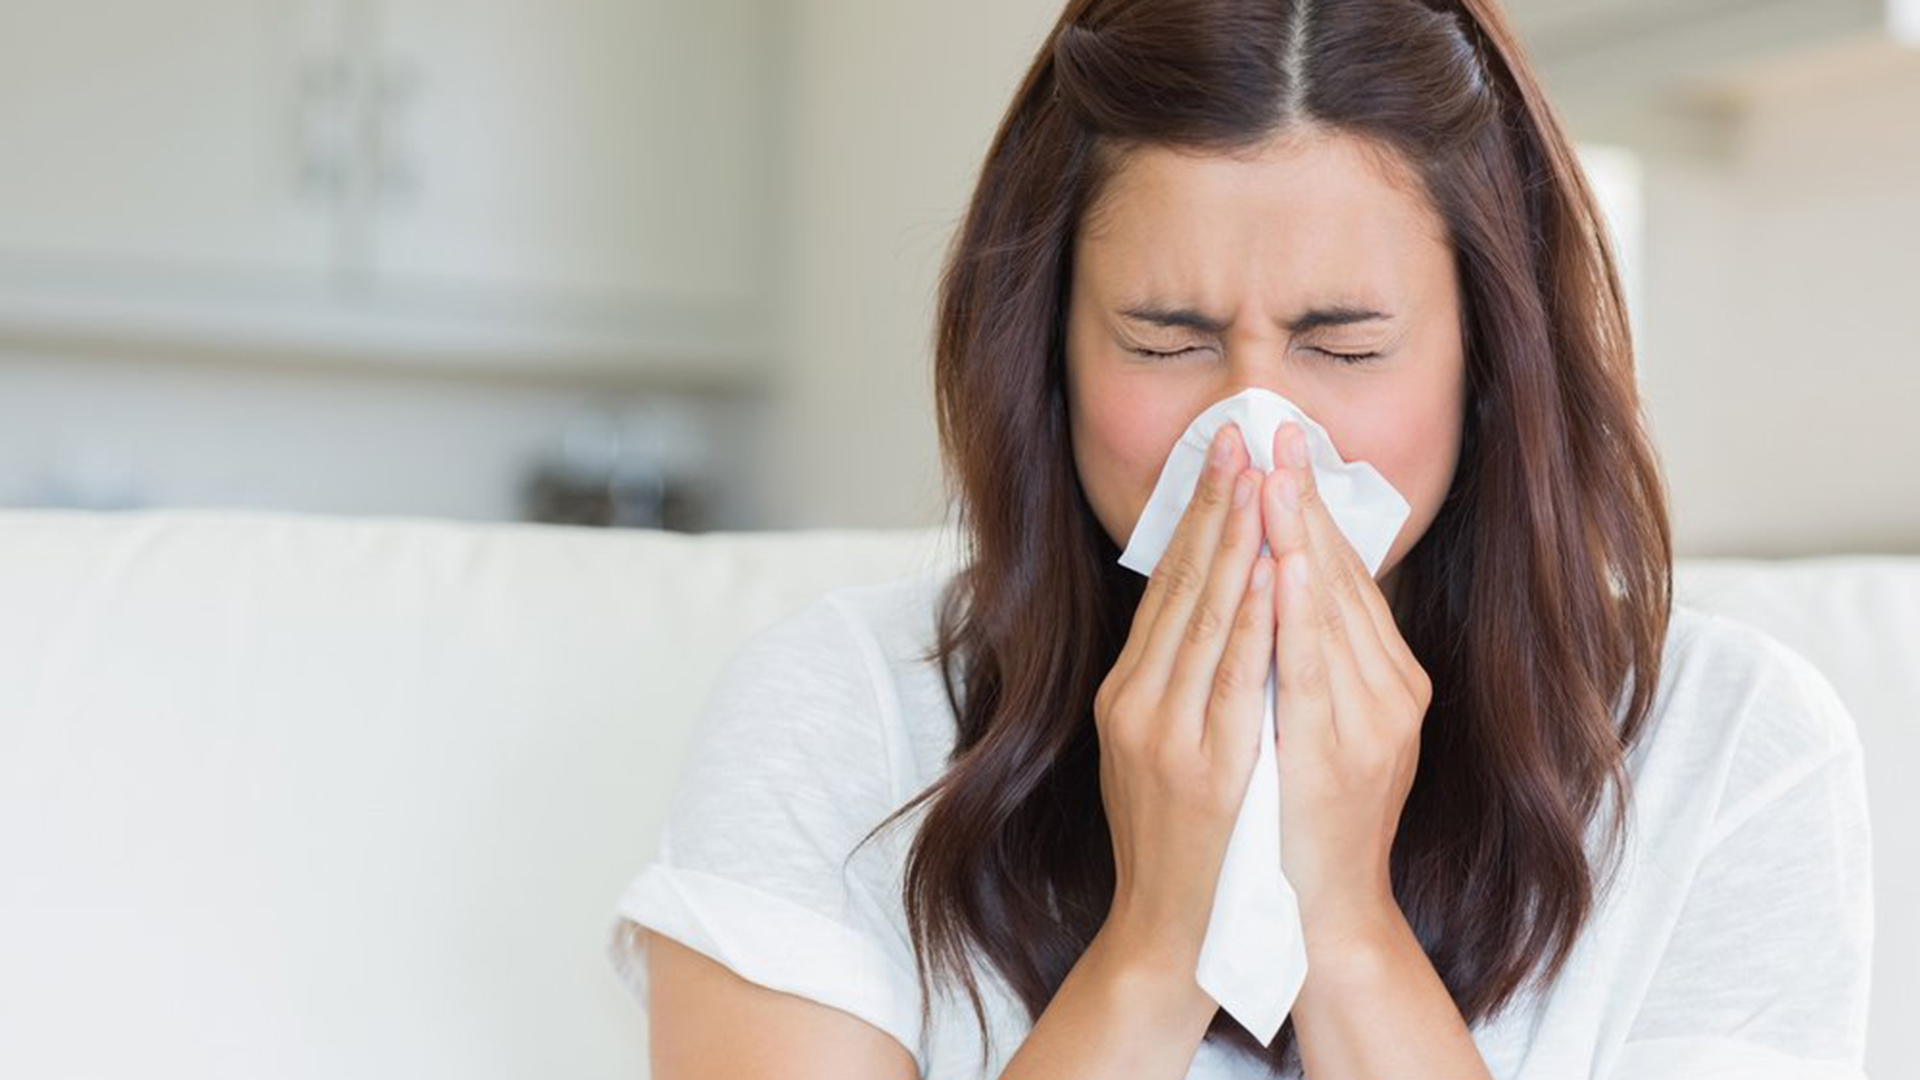 Acupuncture, Allergies, Inflamation, Seasonal Allergies ...